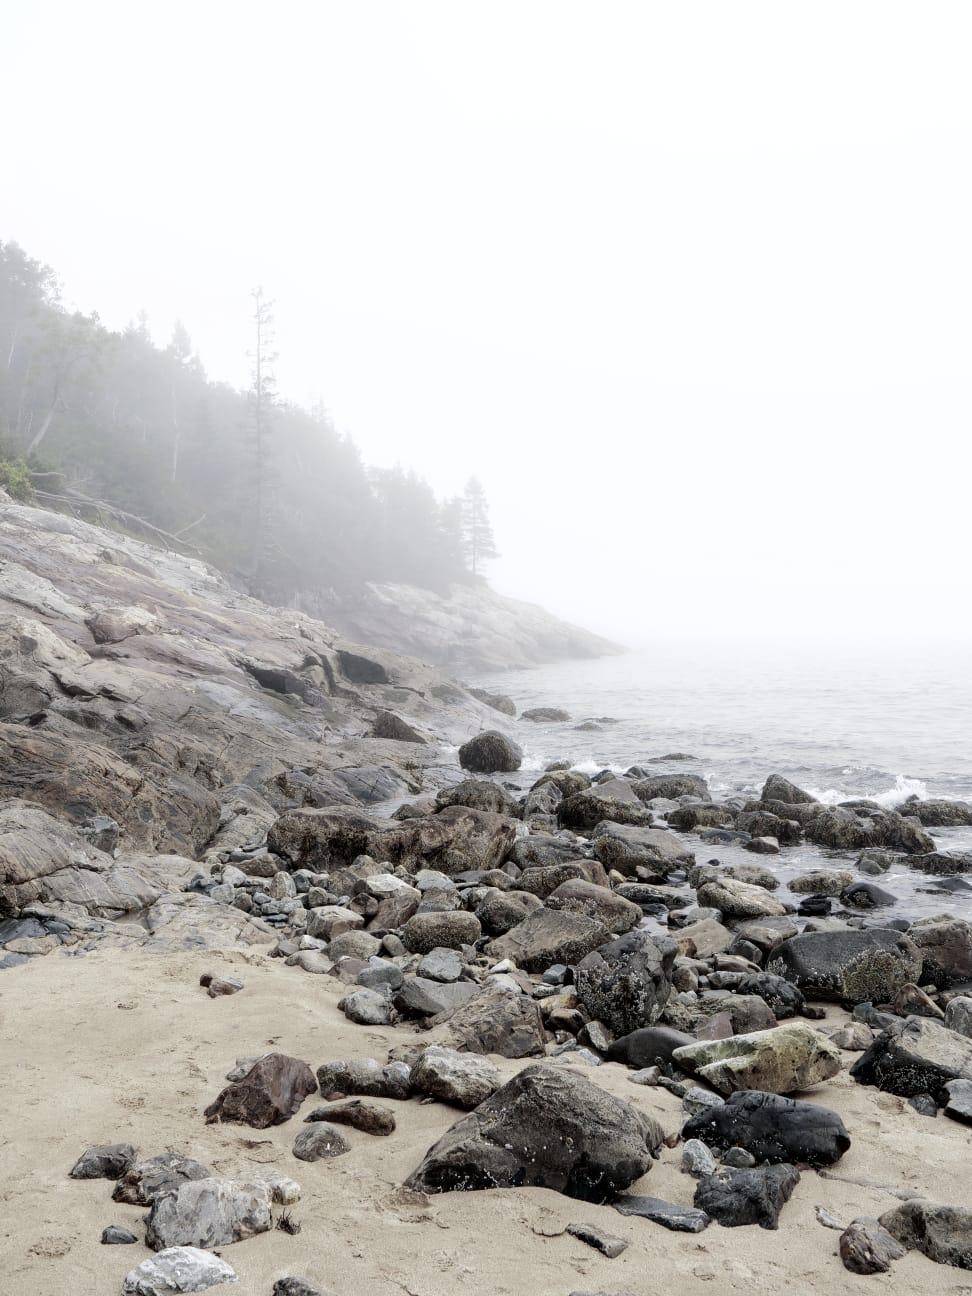 Sand Beach, Maine. Photo by: Sarah Funk